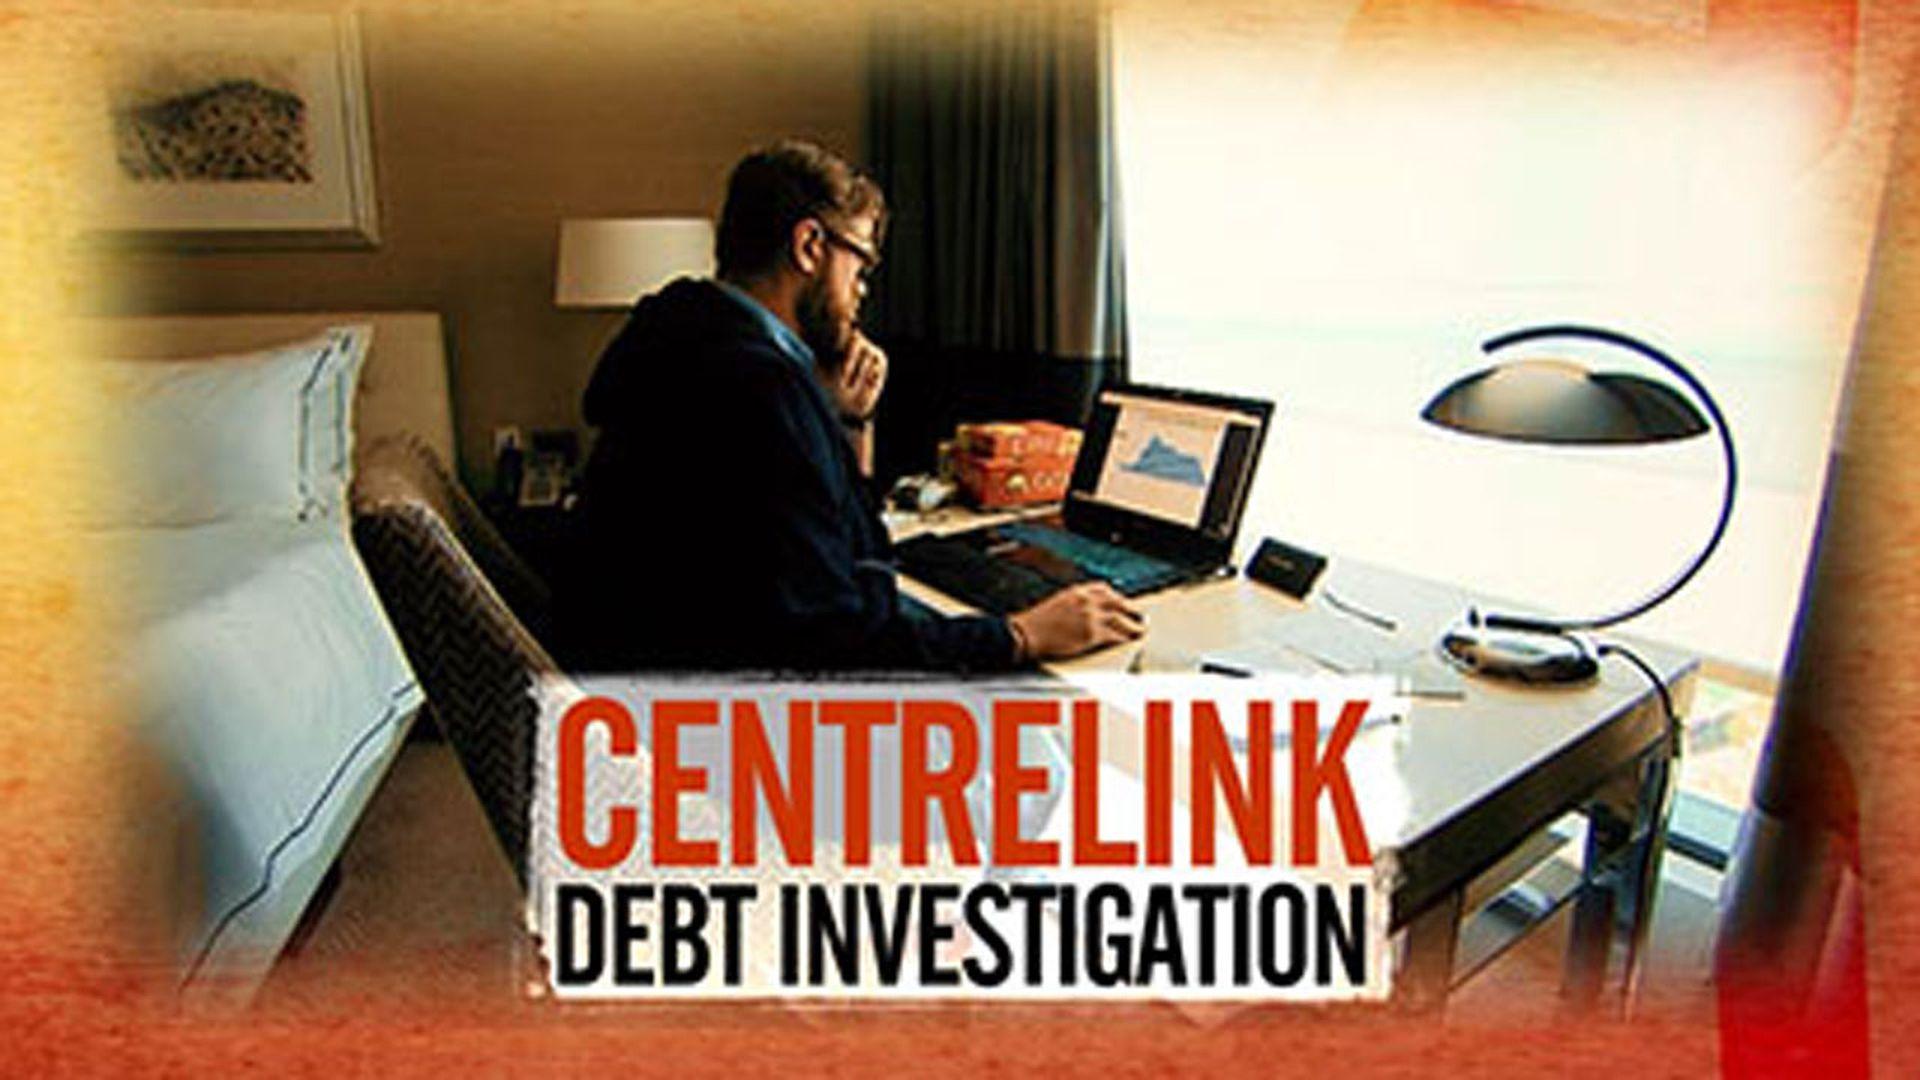 Centrelink debt investigation A Current Affair Extras 2017